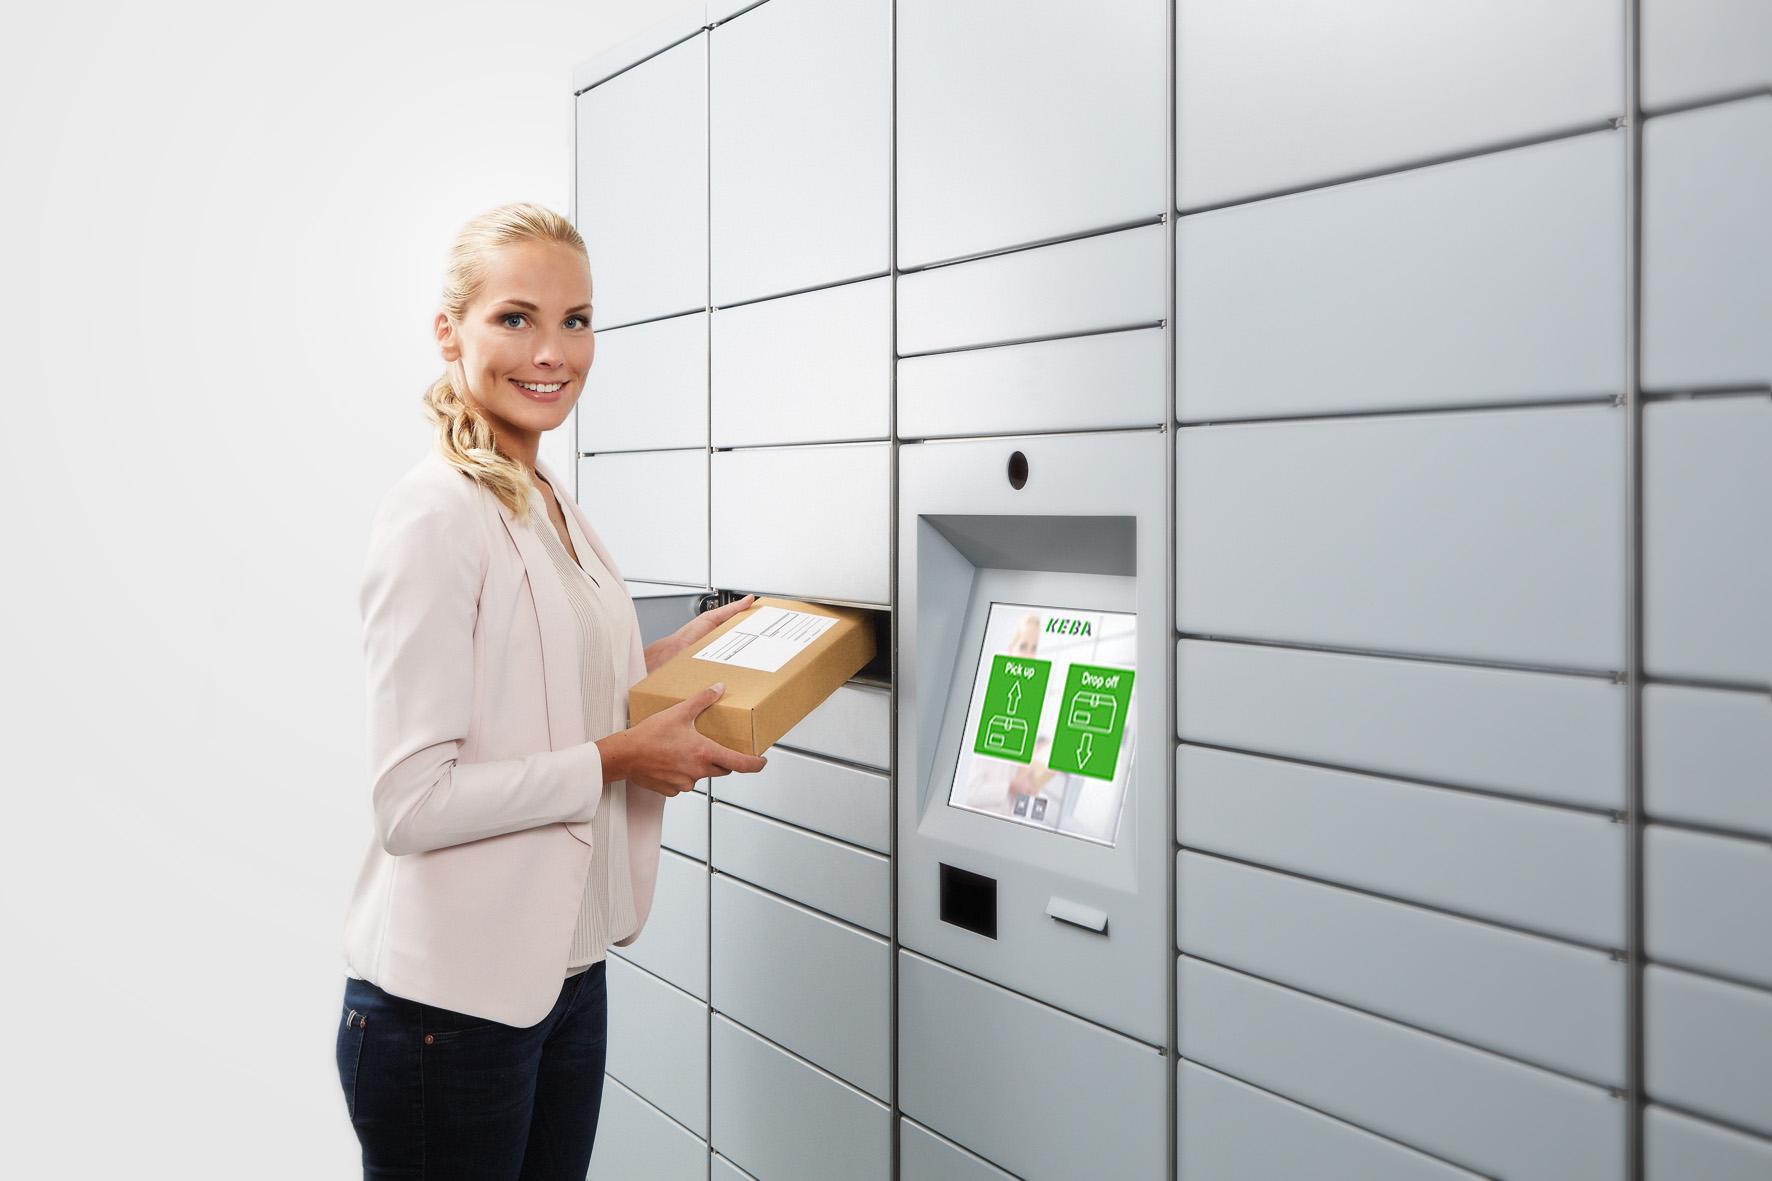 KEBA parcel automation solution